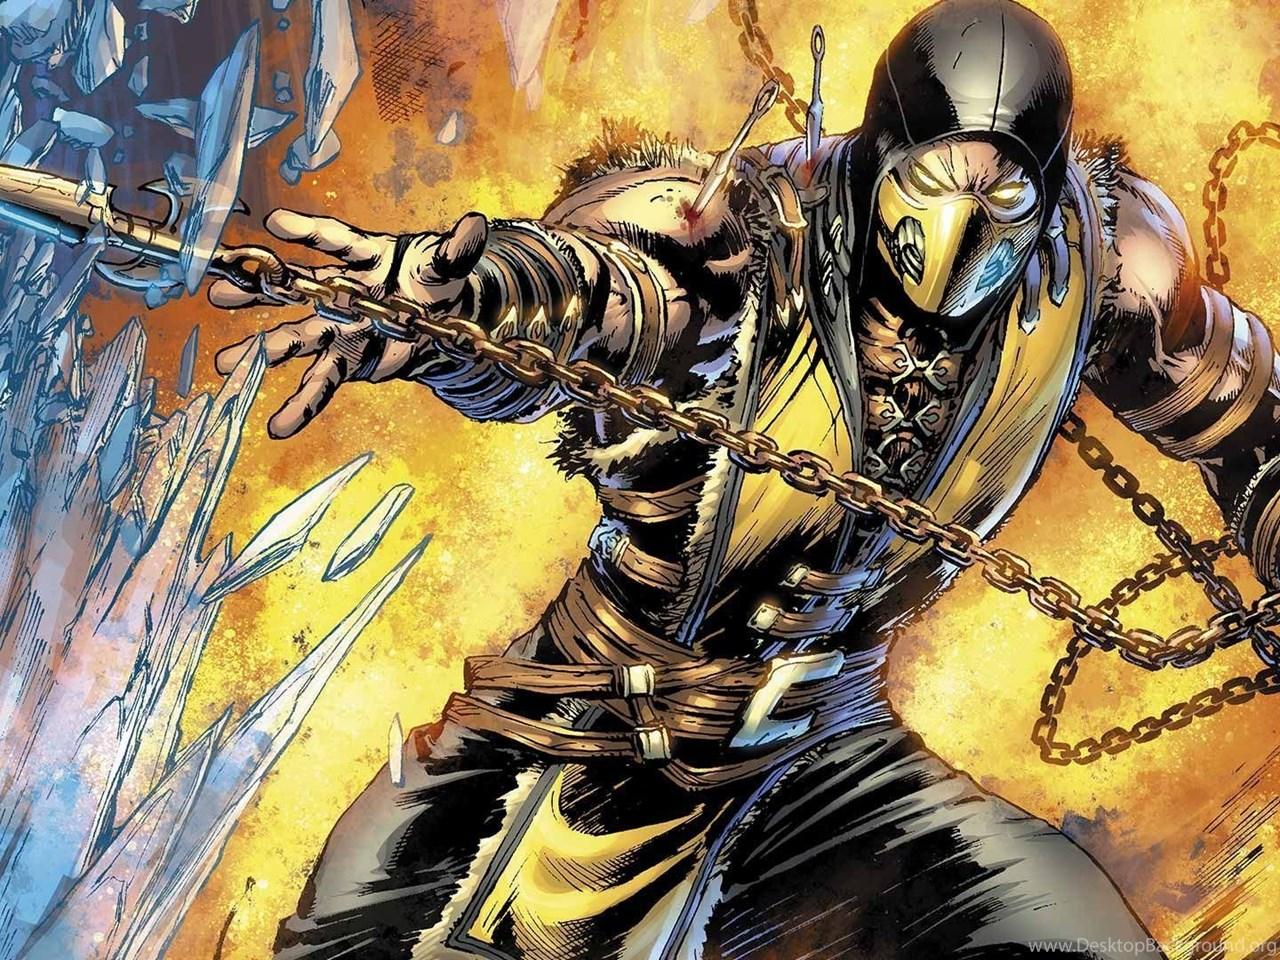 Mortal Kombat Scorpion Wallpapers For Android Desktop Background